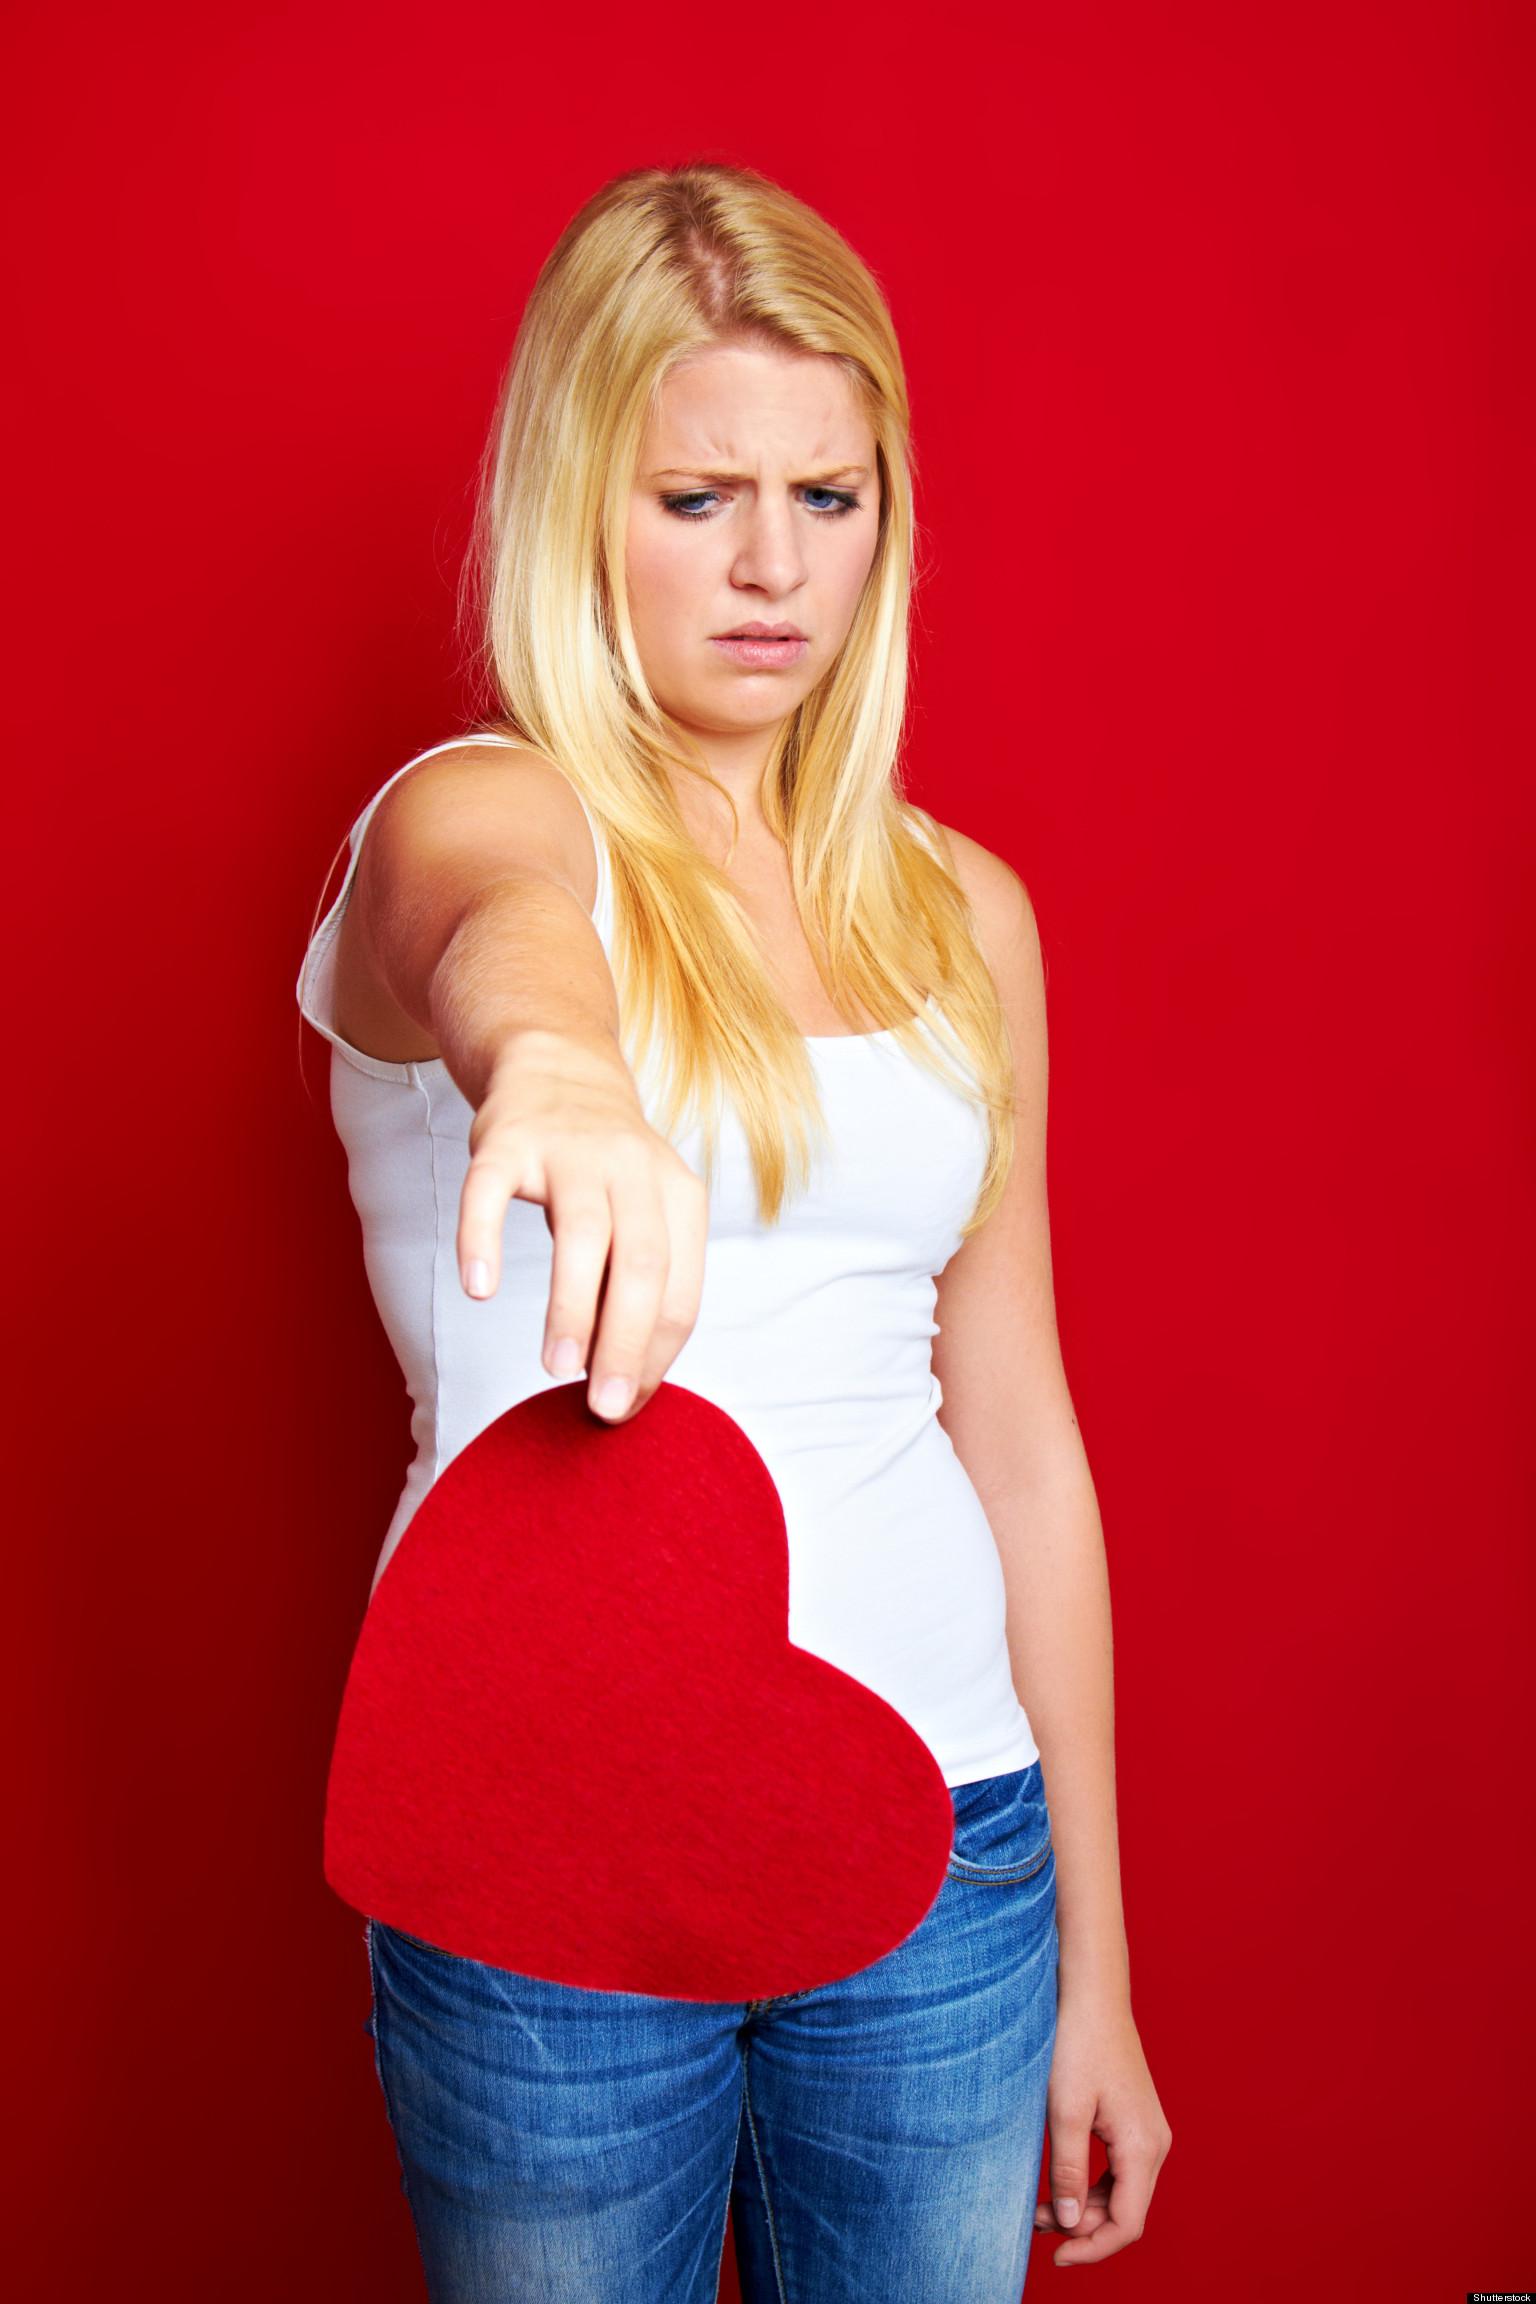 Emily Hartridge British Blogger On 10 Reasons Why